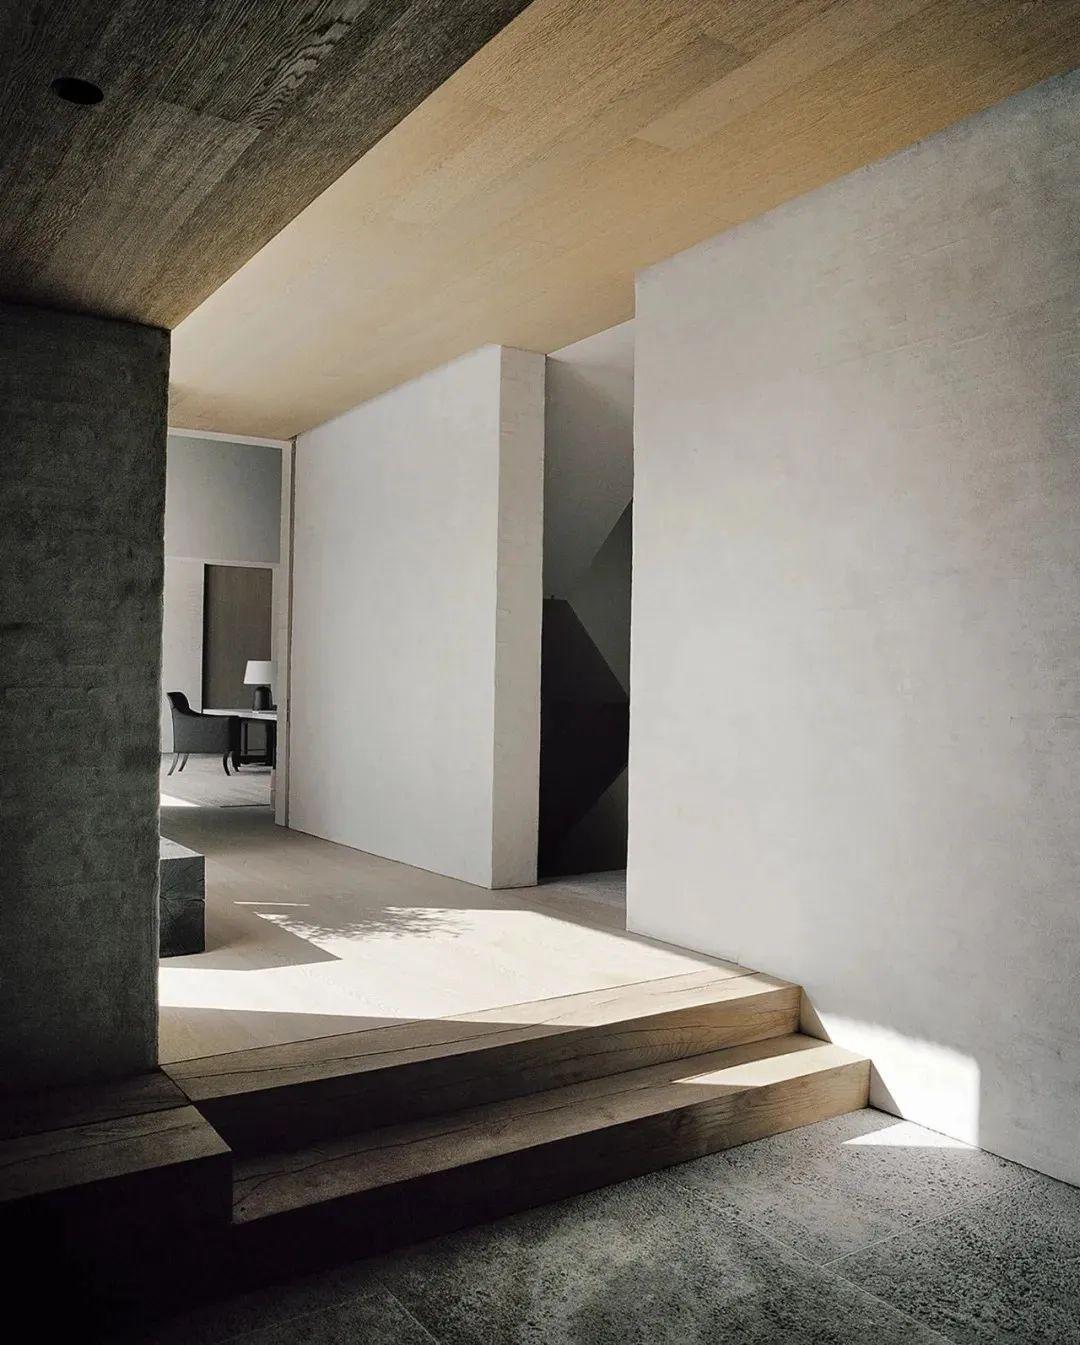 Vincent van Duysen新作:朴素是极致的美,矜贵的质感!